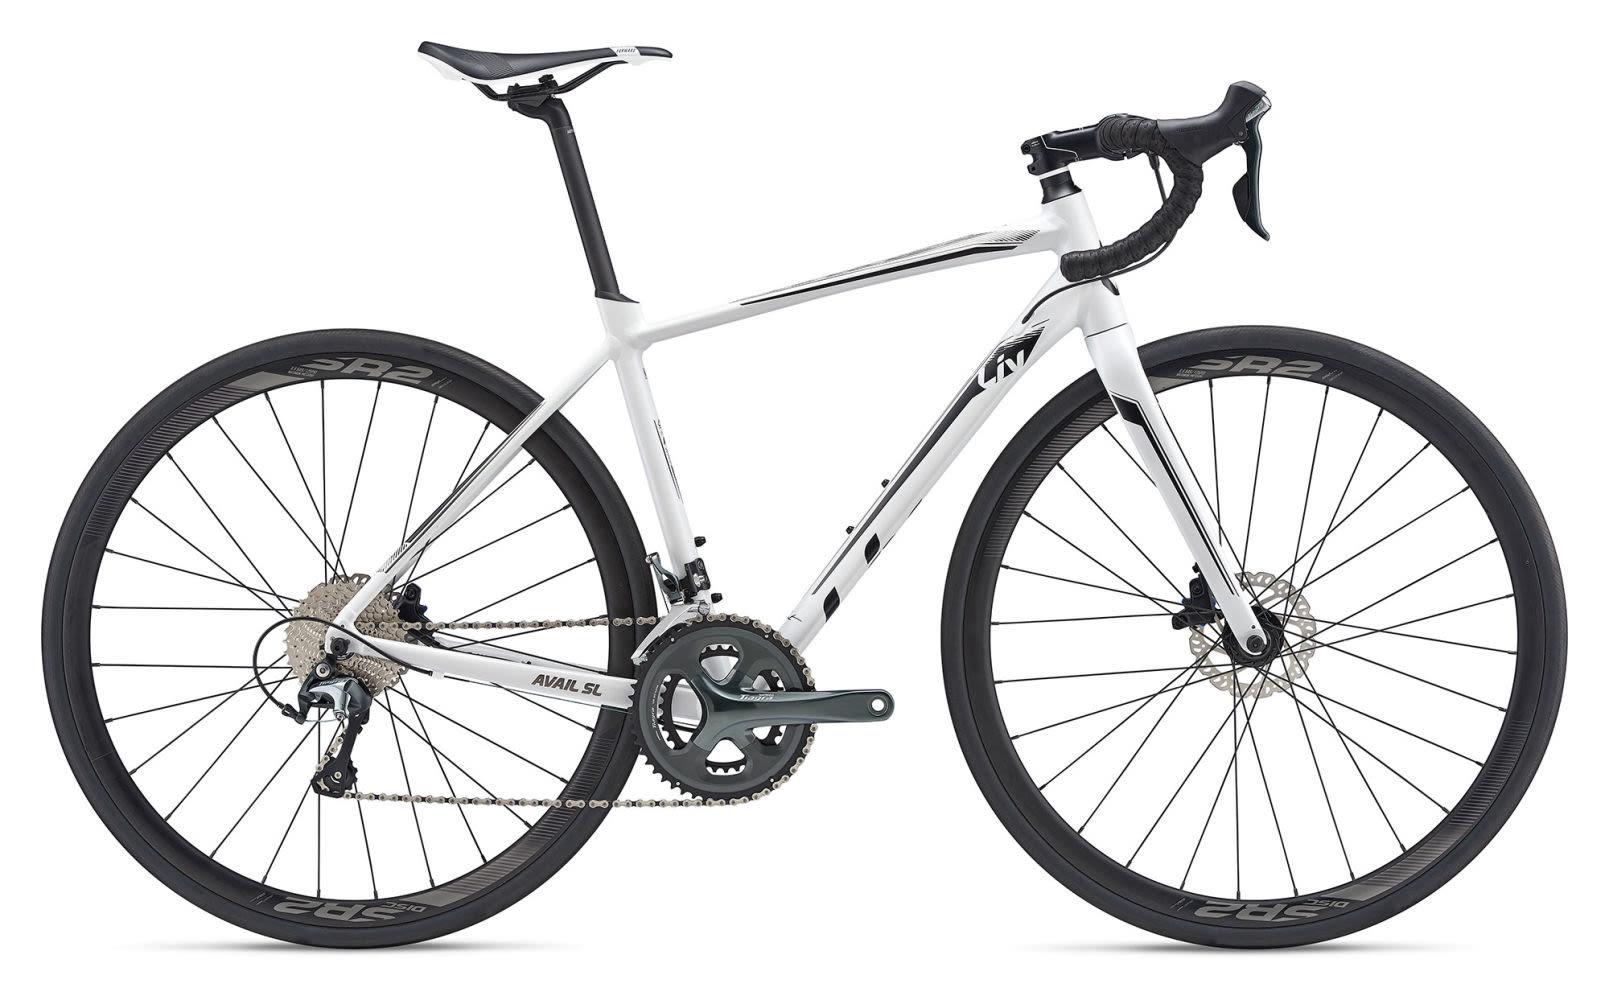 2019 Liv Avail SL 2 Disc Womens Road bike in White